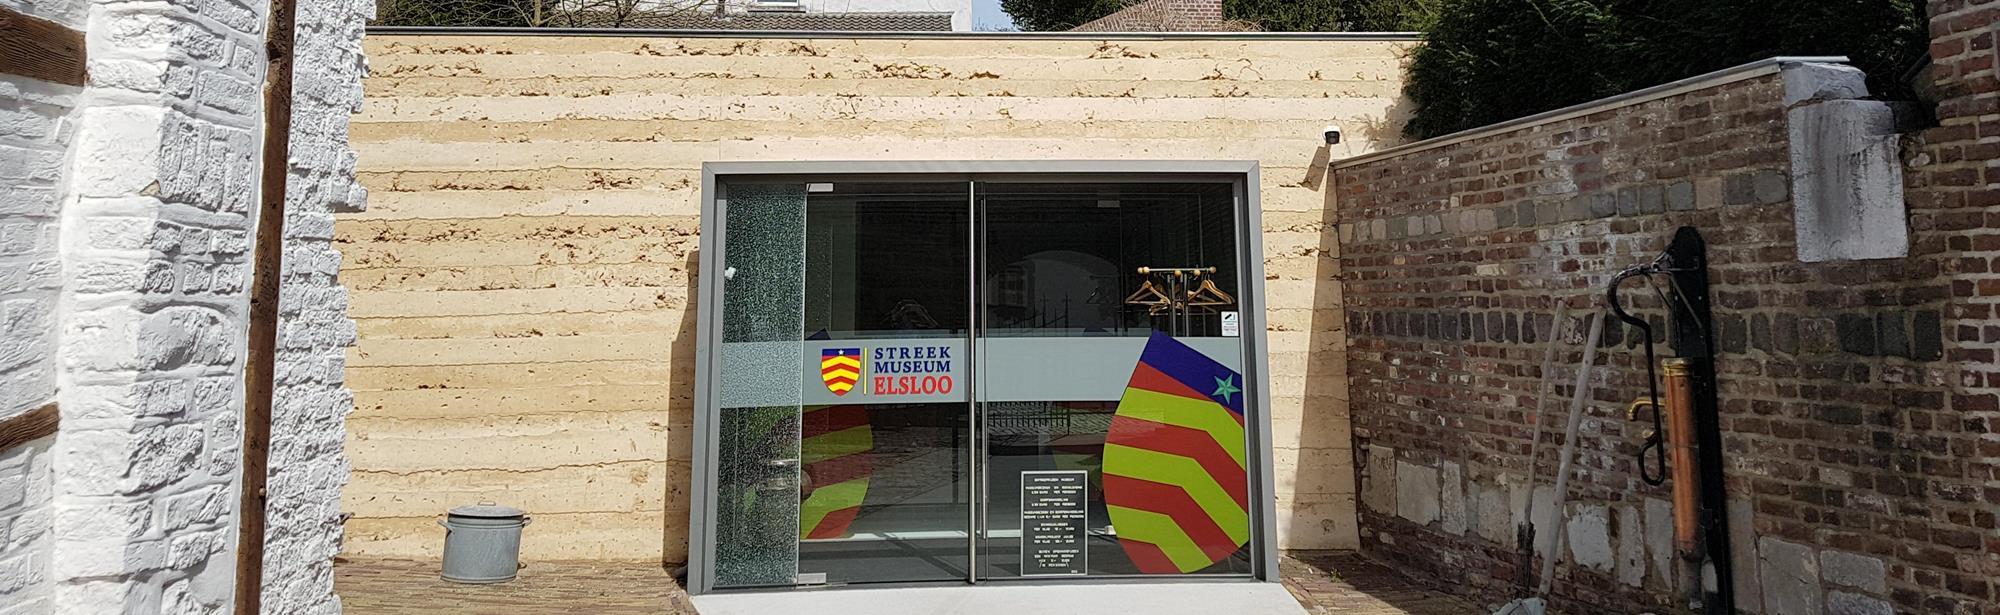 Stichting Streekmuseum Elsloo